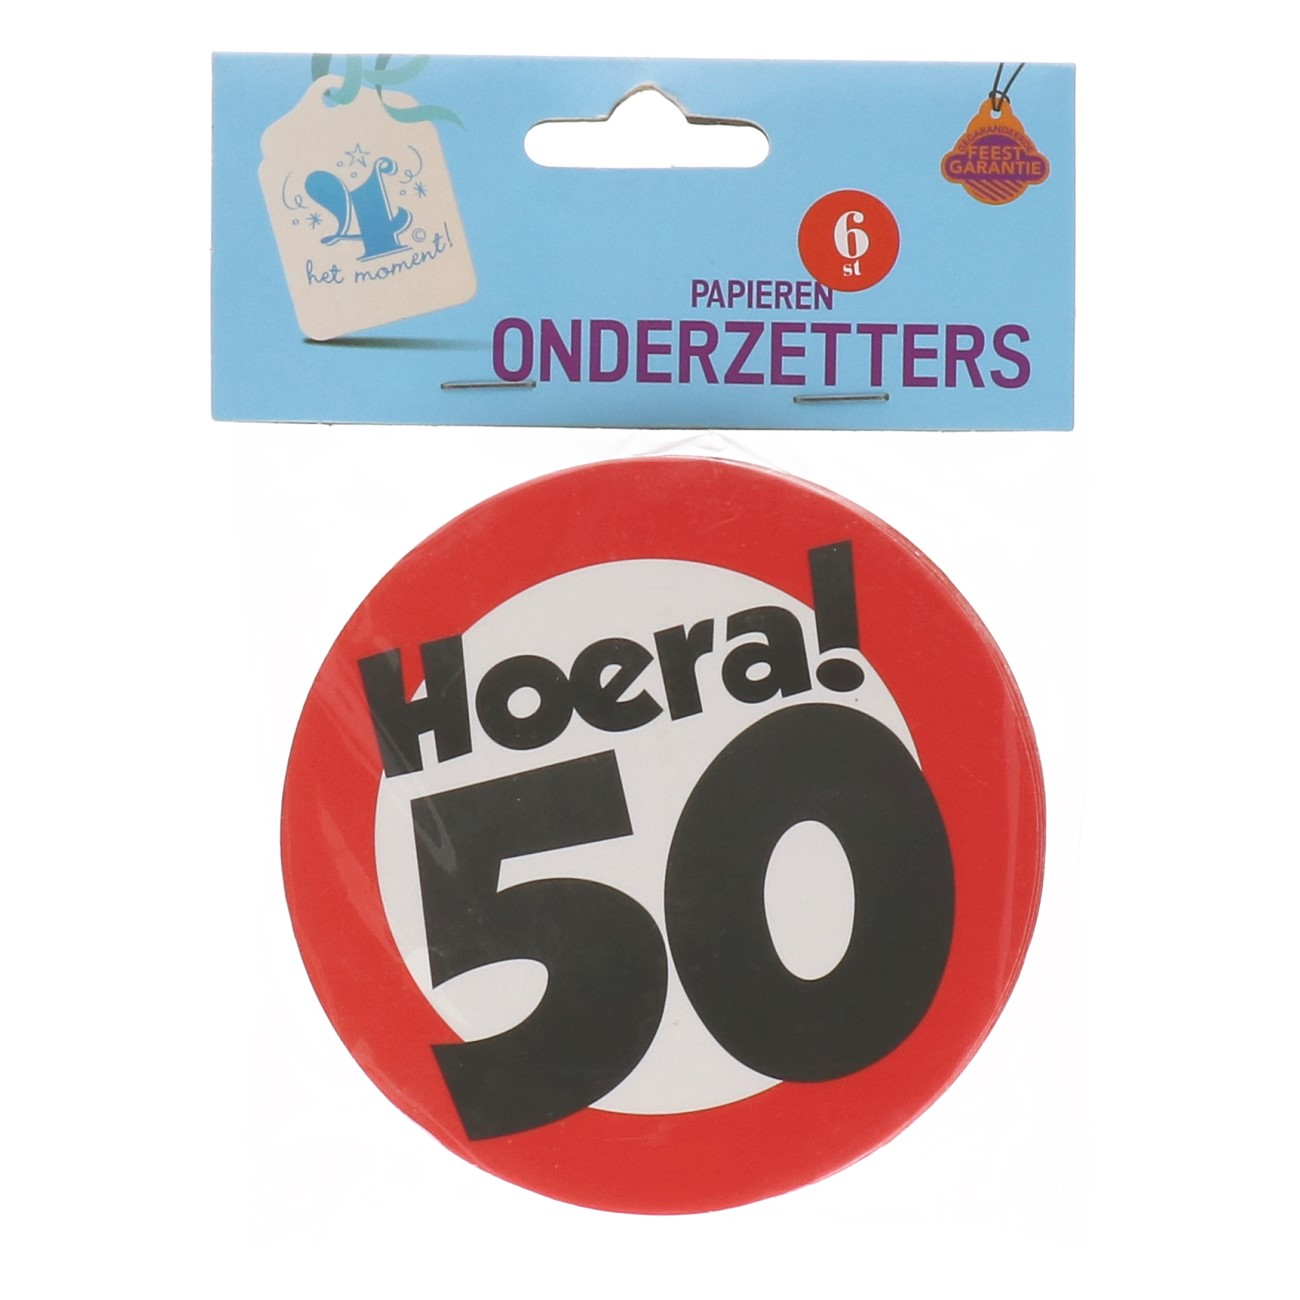 Onderzetters verkeersbord 50 jaar 6 st